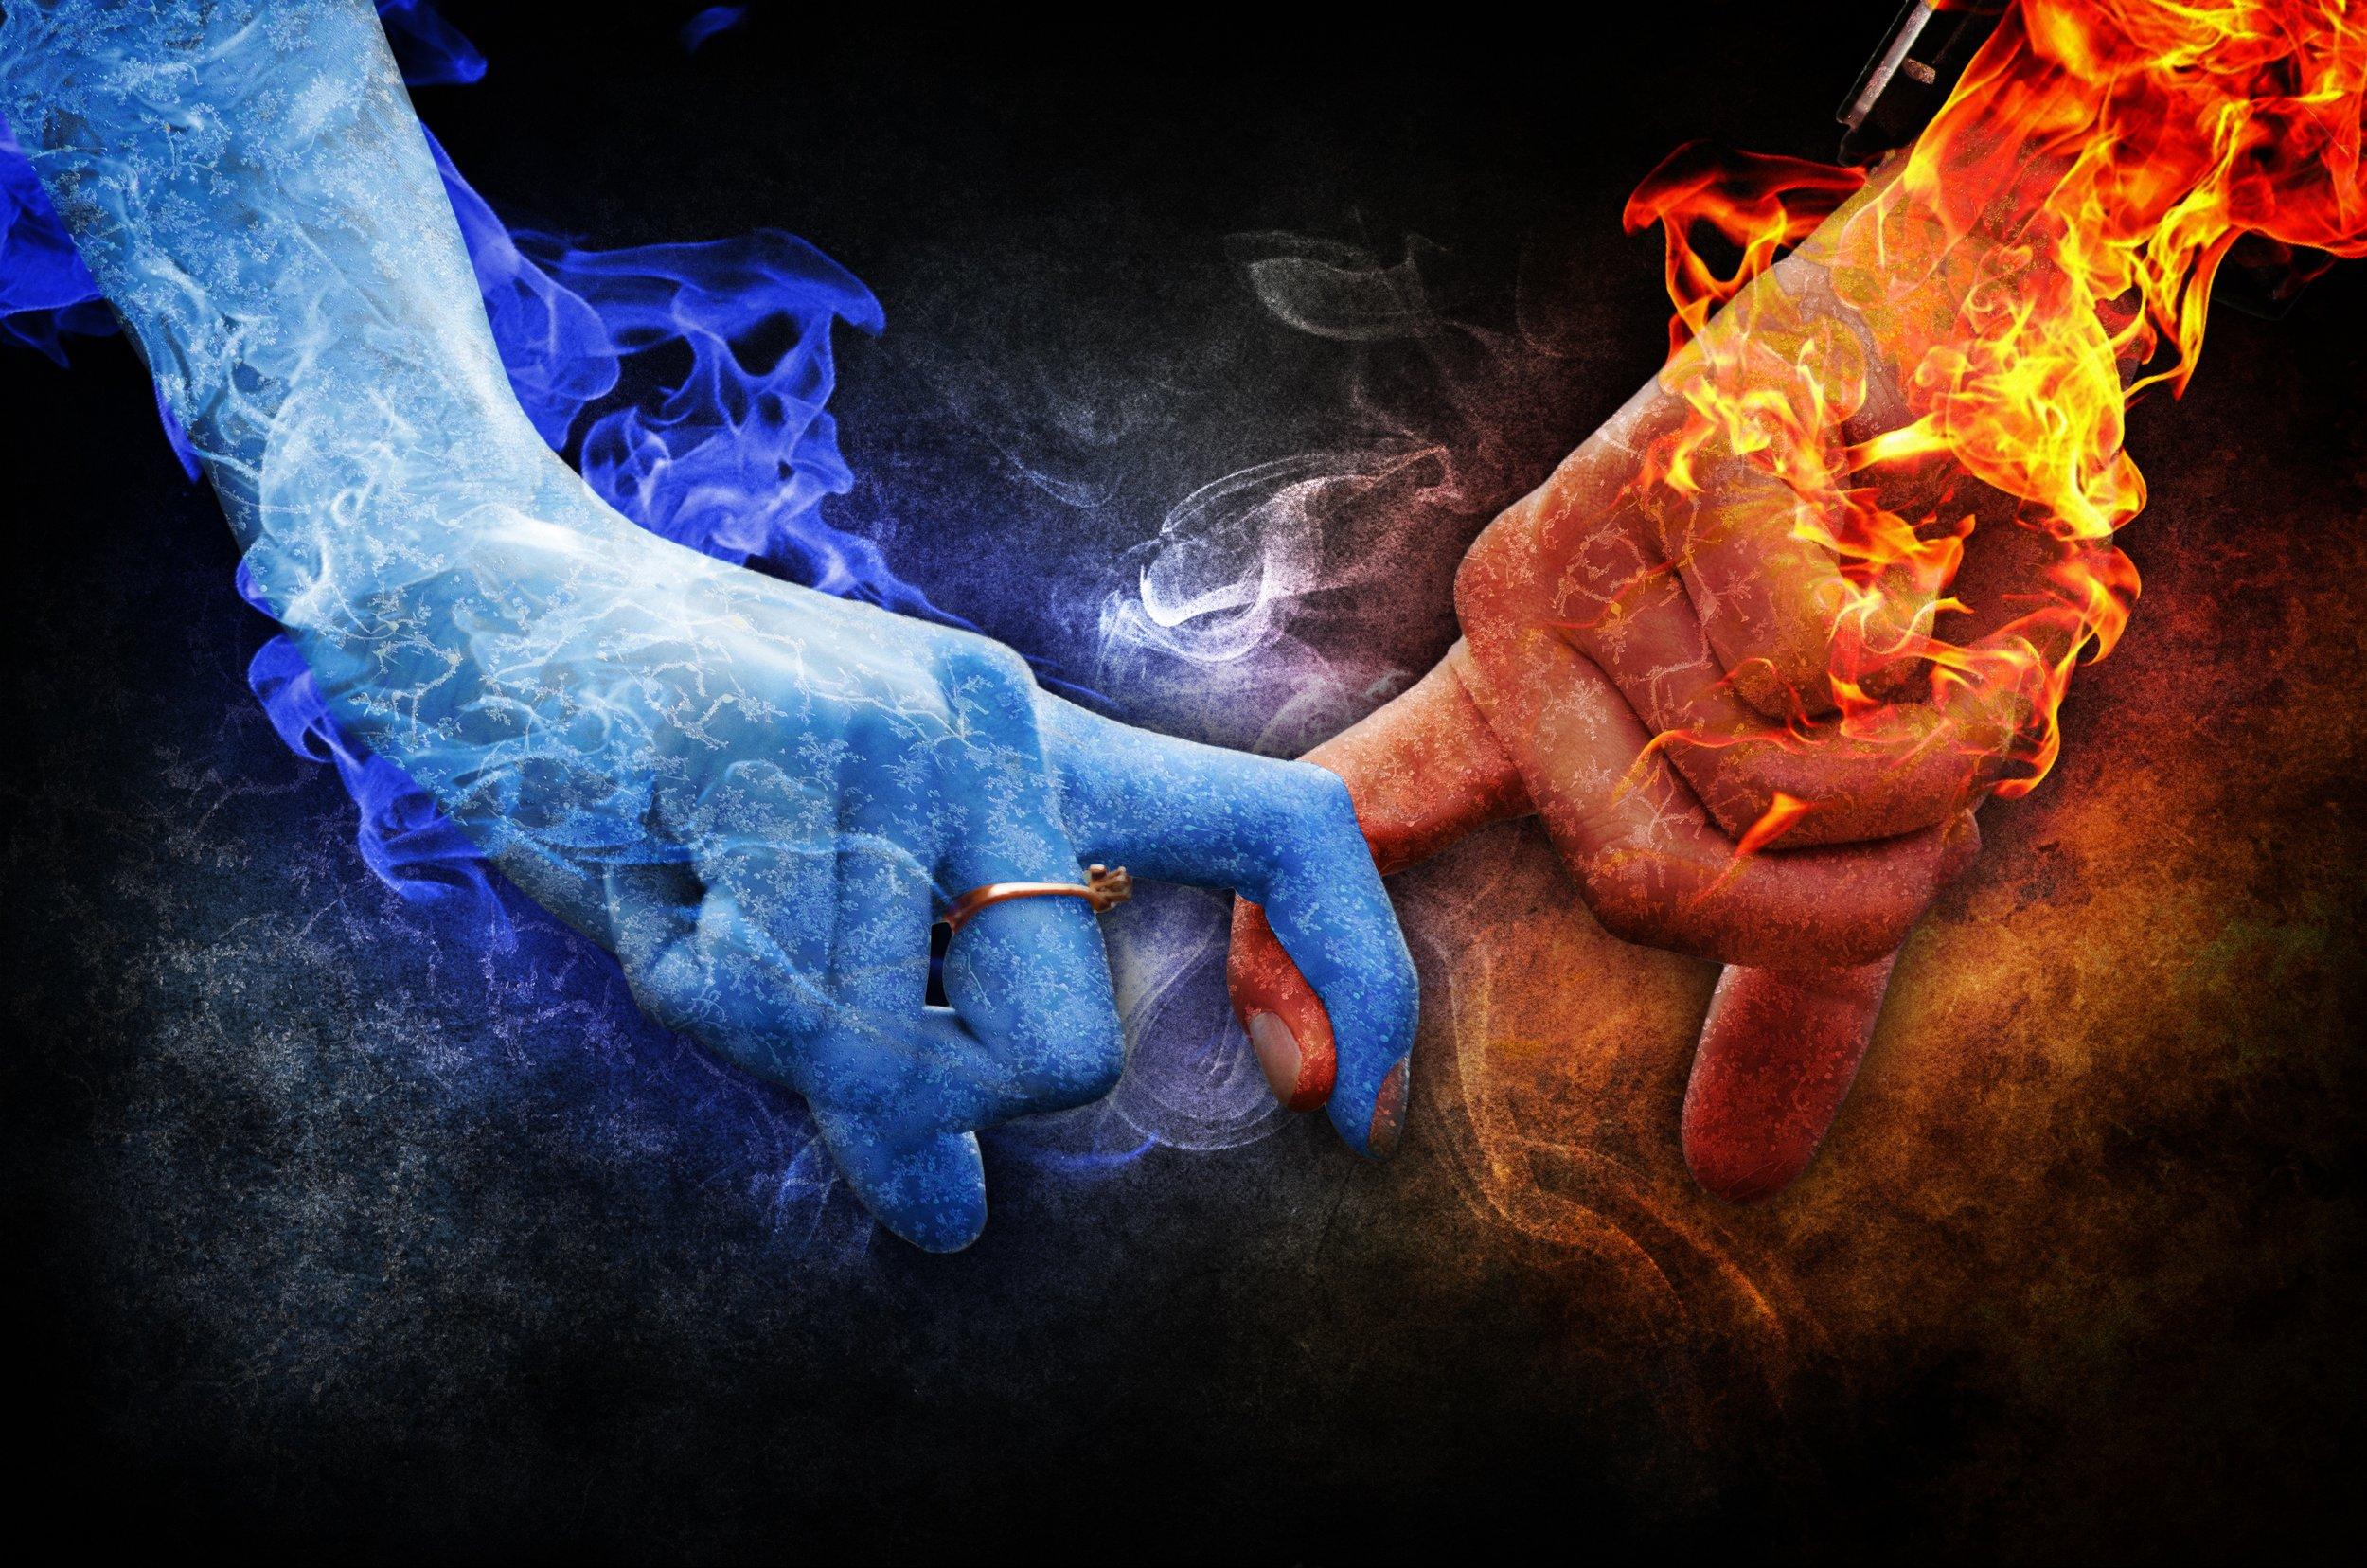 abstract-ice-love-flame-fire-romance-732741-pxhere.com.jpg